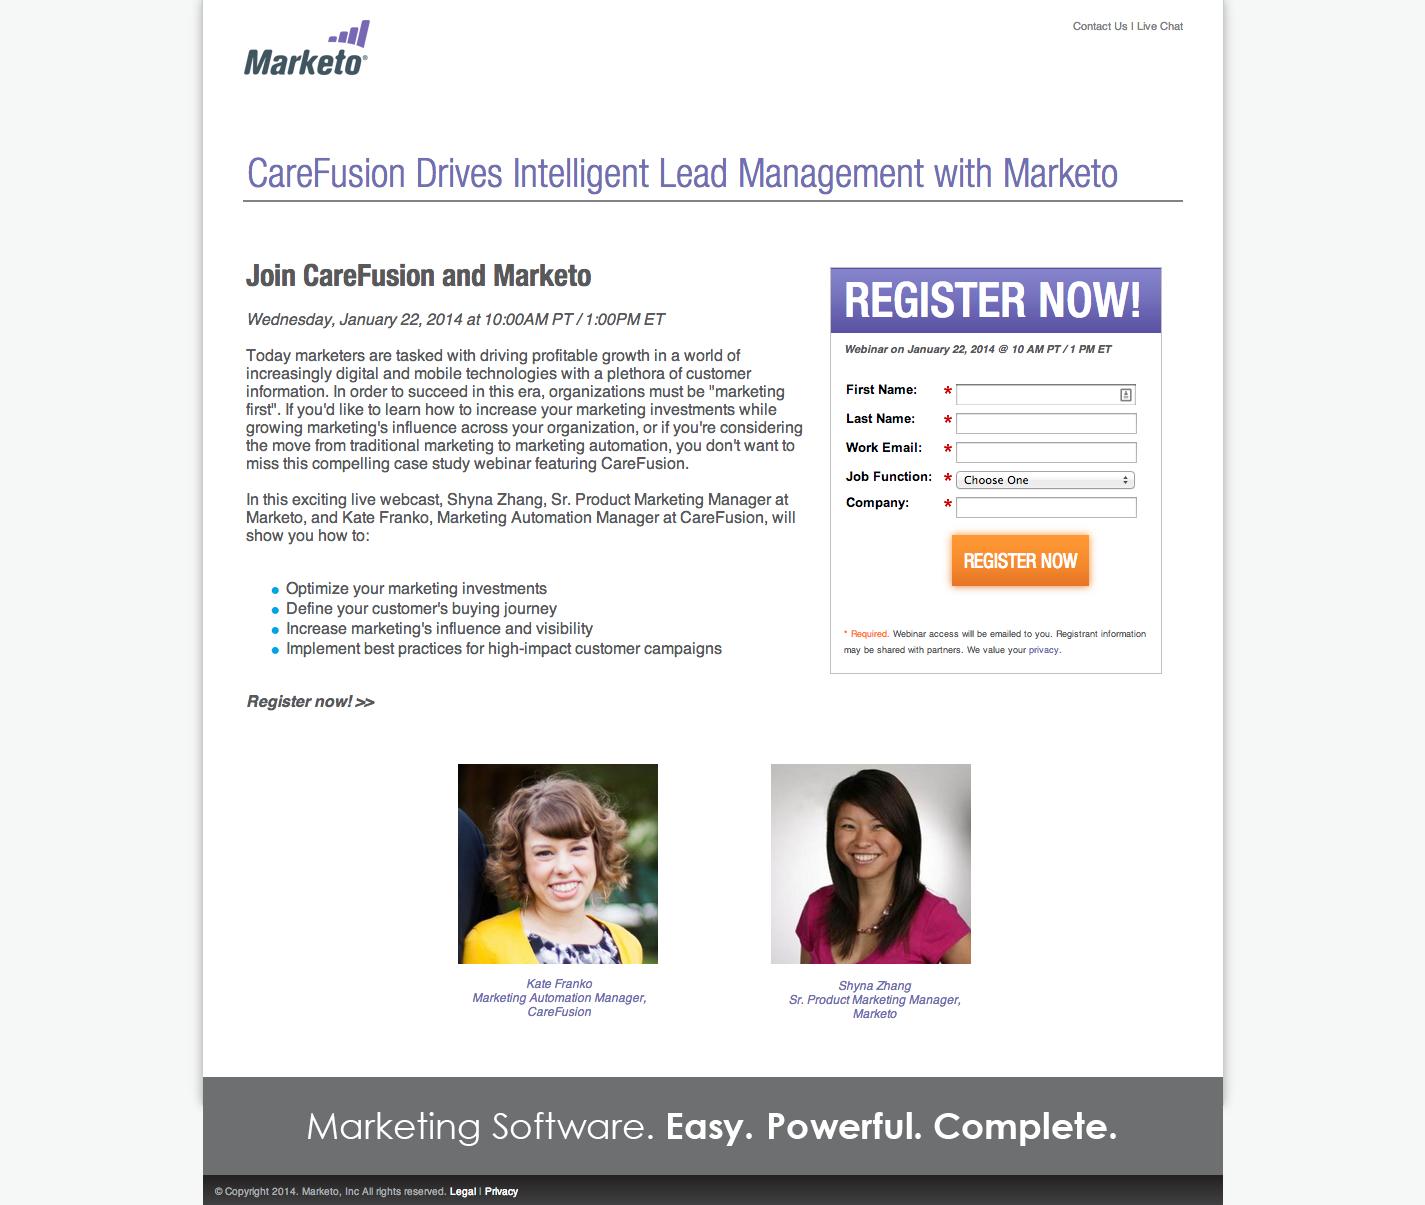 Best practices for webinar landing pages the effective marketer webinar registration from marketo stopboris Gallery